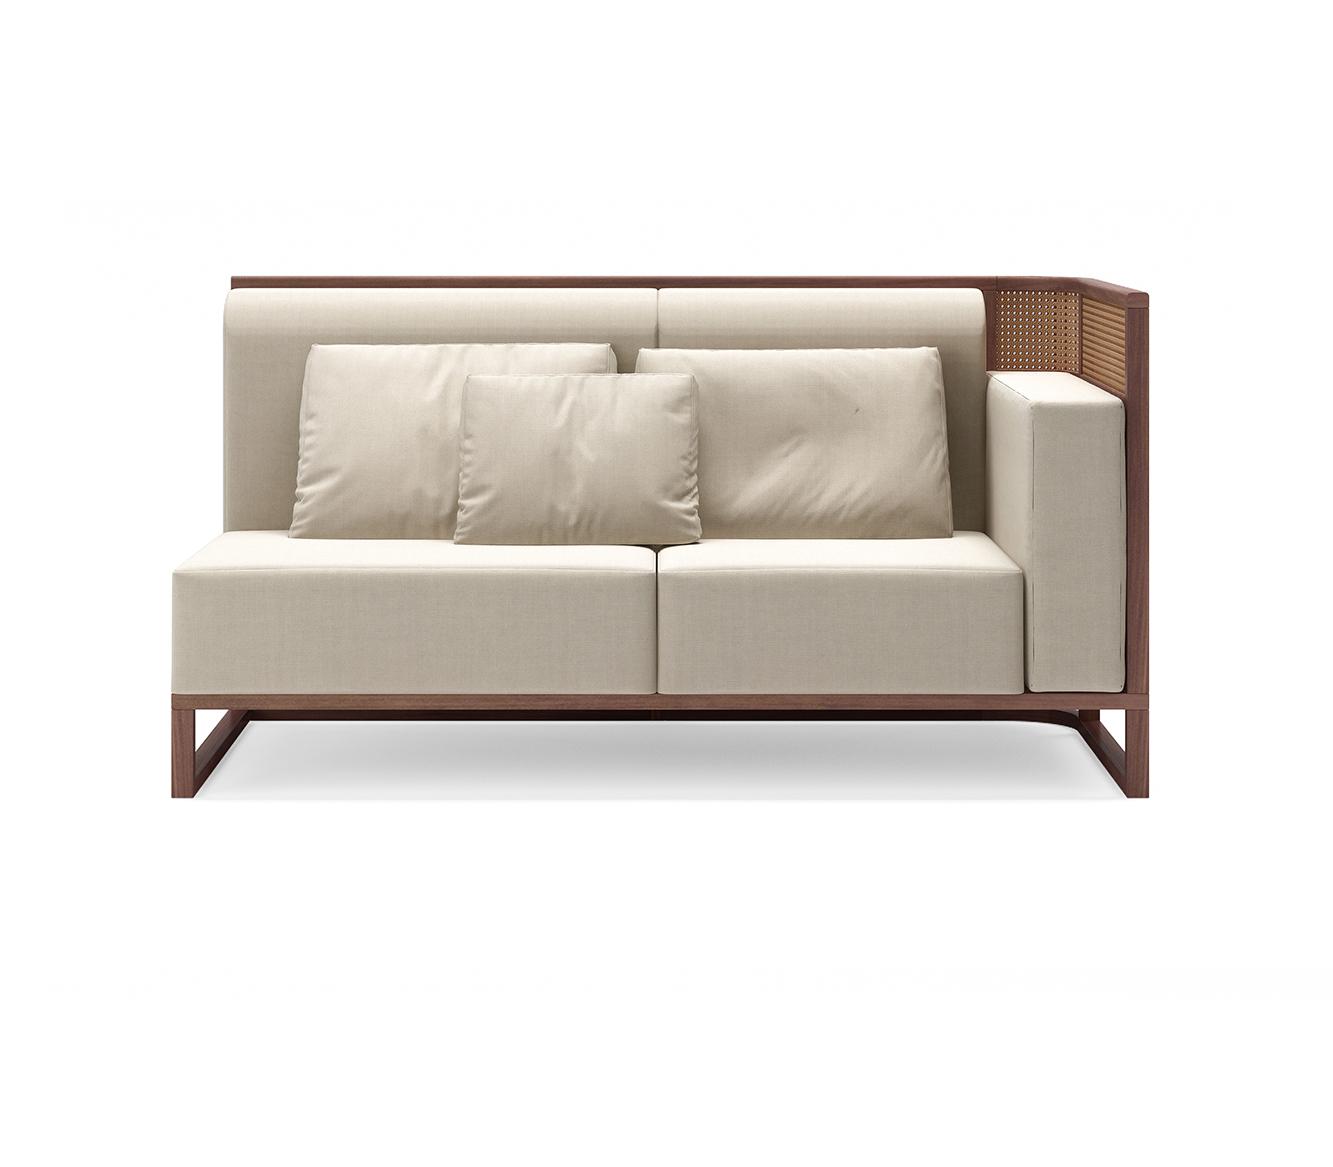 组合沙发 Modular sofa Y-53a1 / a2